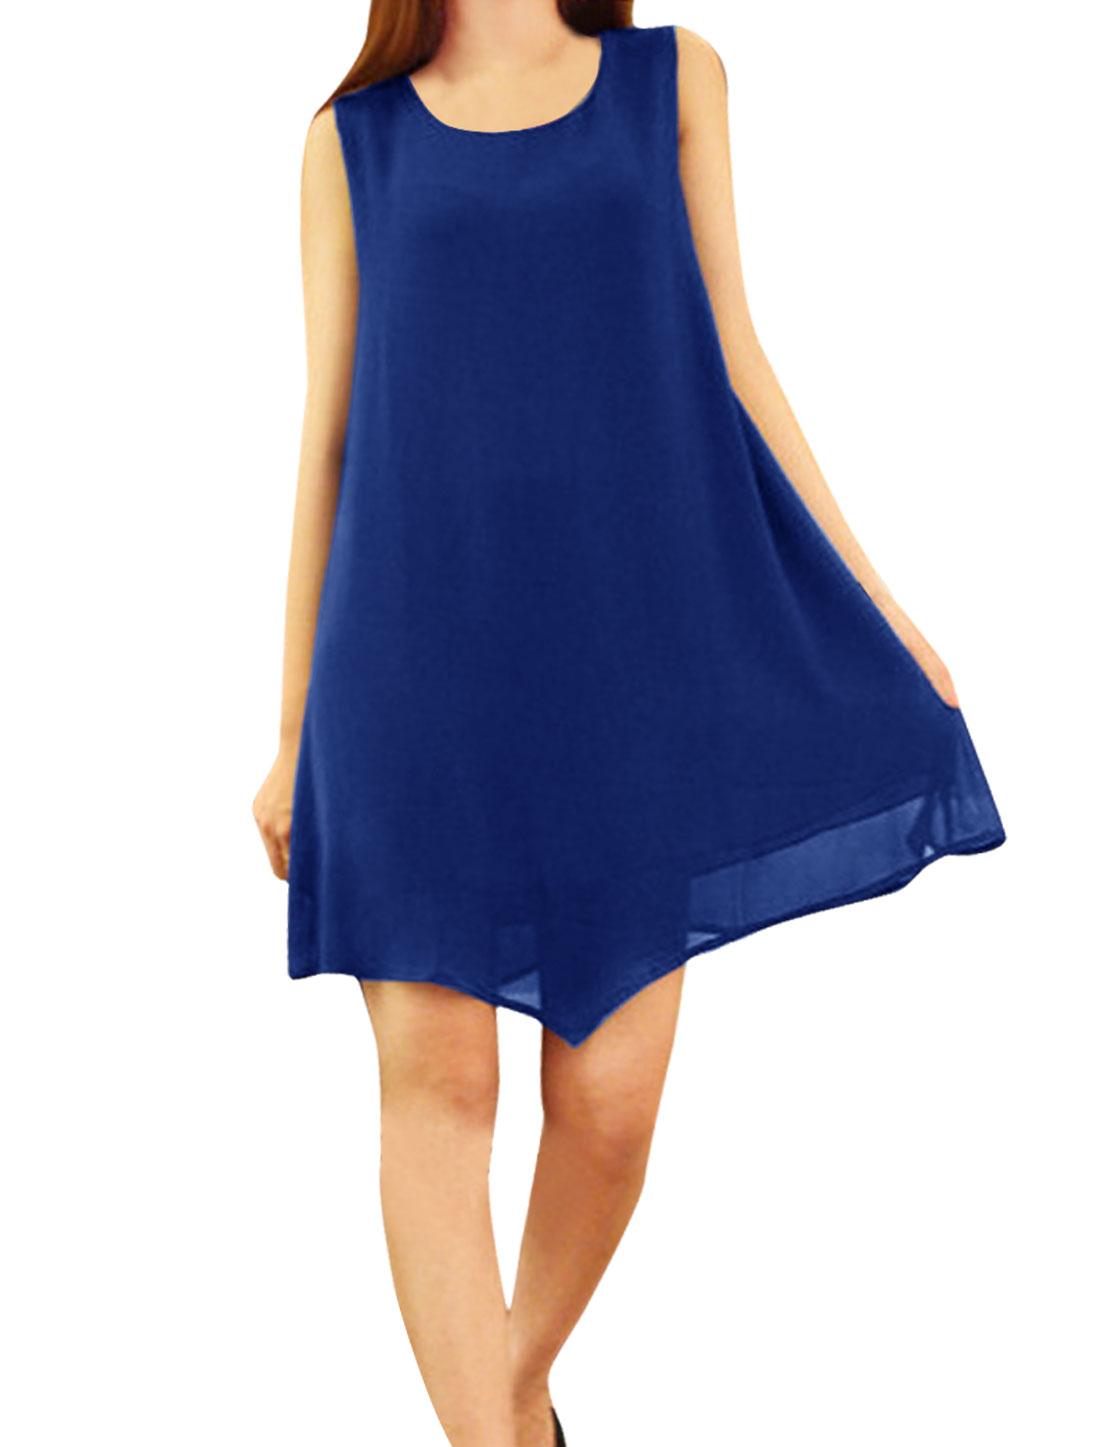 Ladies Irregular Hem Elegant Above Knee Chiffon Dress Royal Blue XS